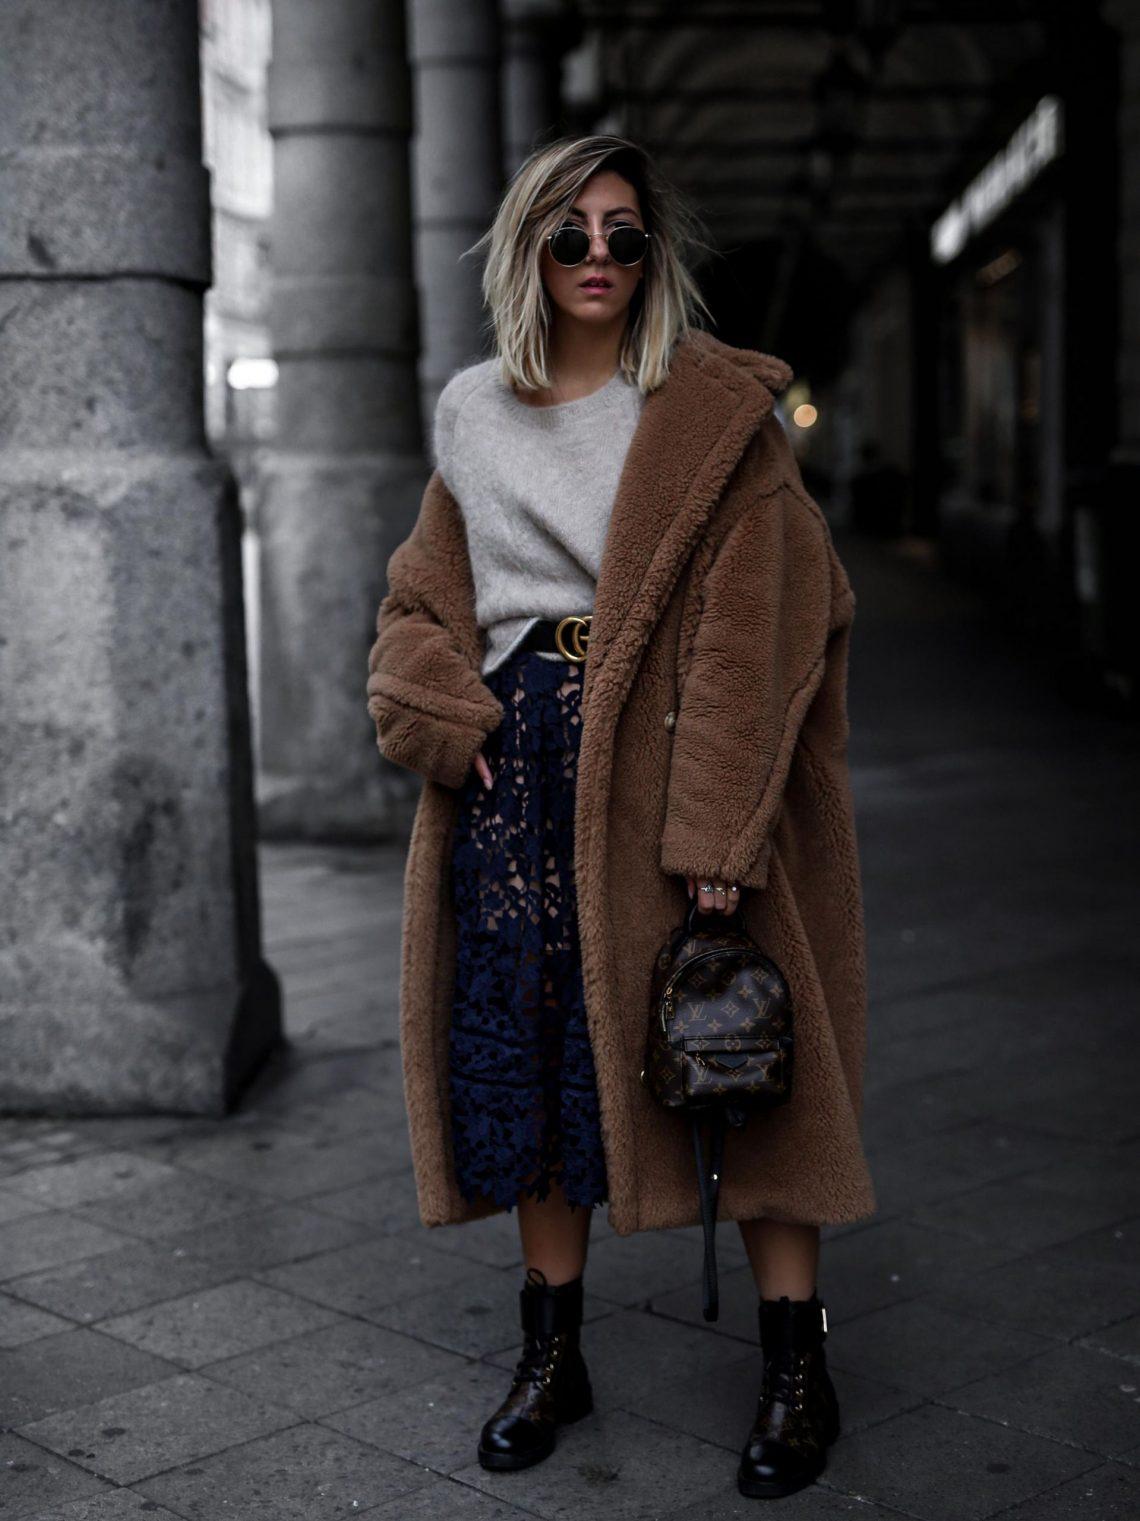 Steal Her Style: Teddy Coat by Aylin König